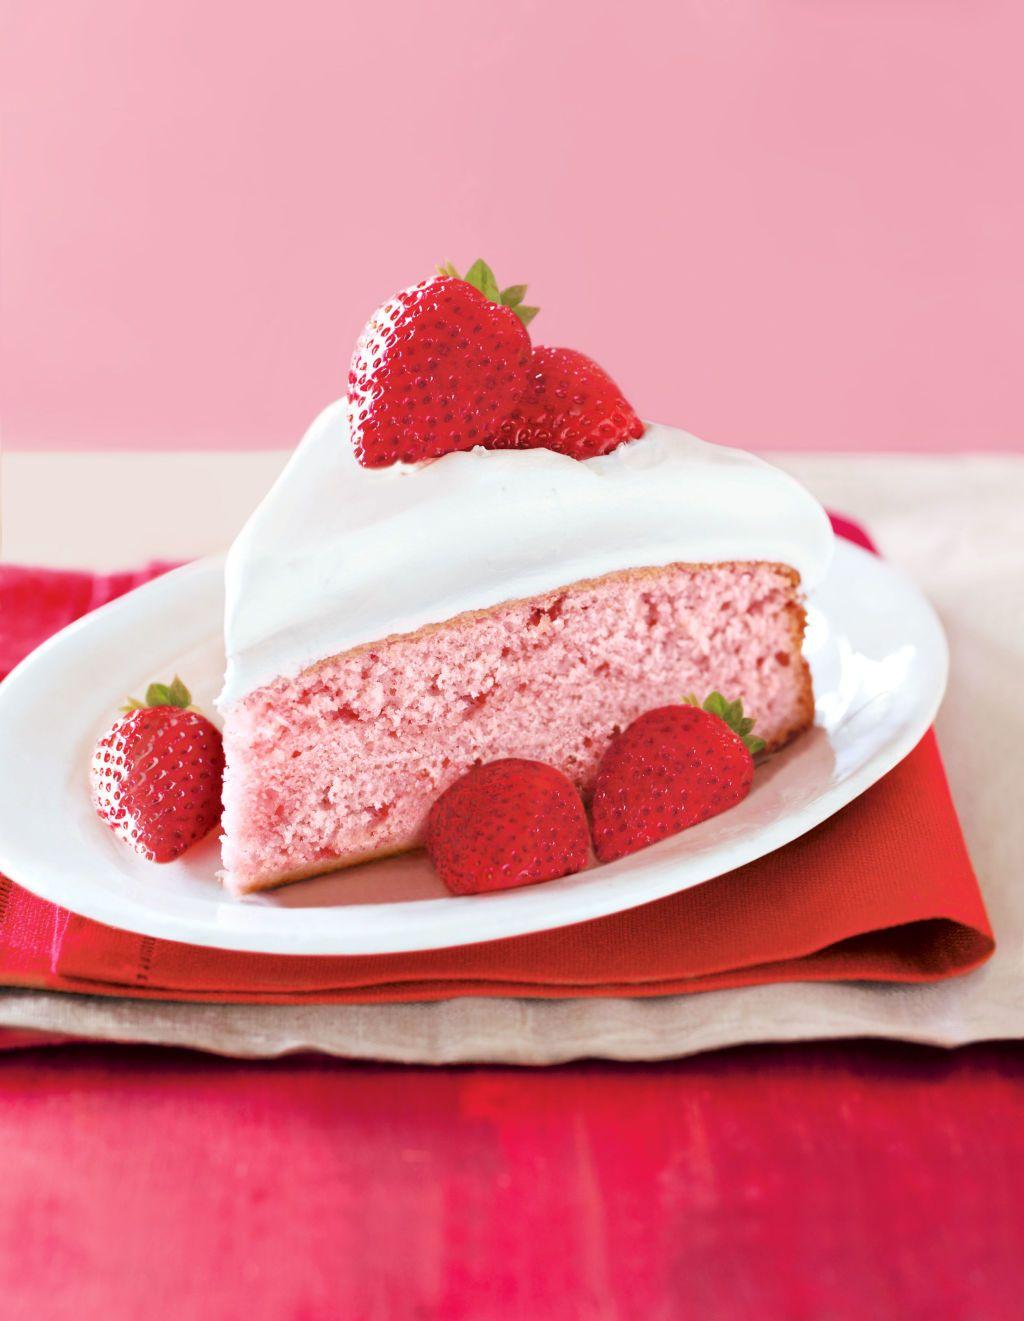 Fresh Strawberry Cake Recipe Strawberry Cake From Scratch